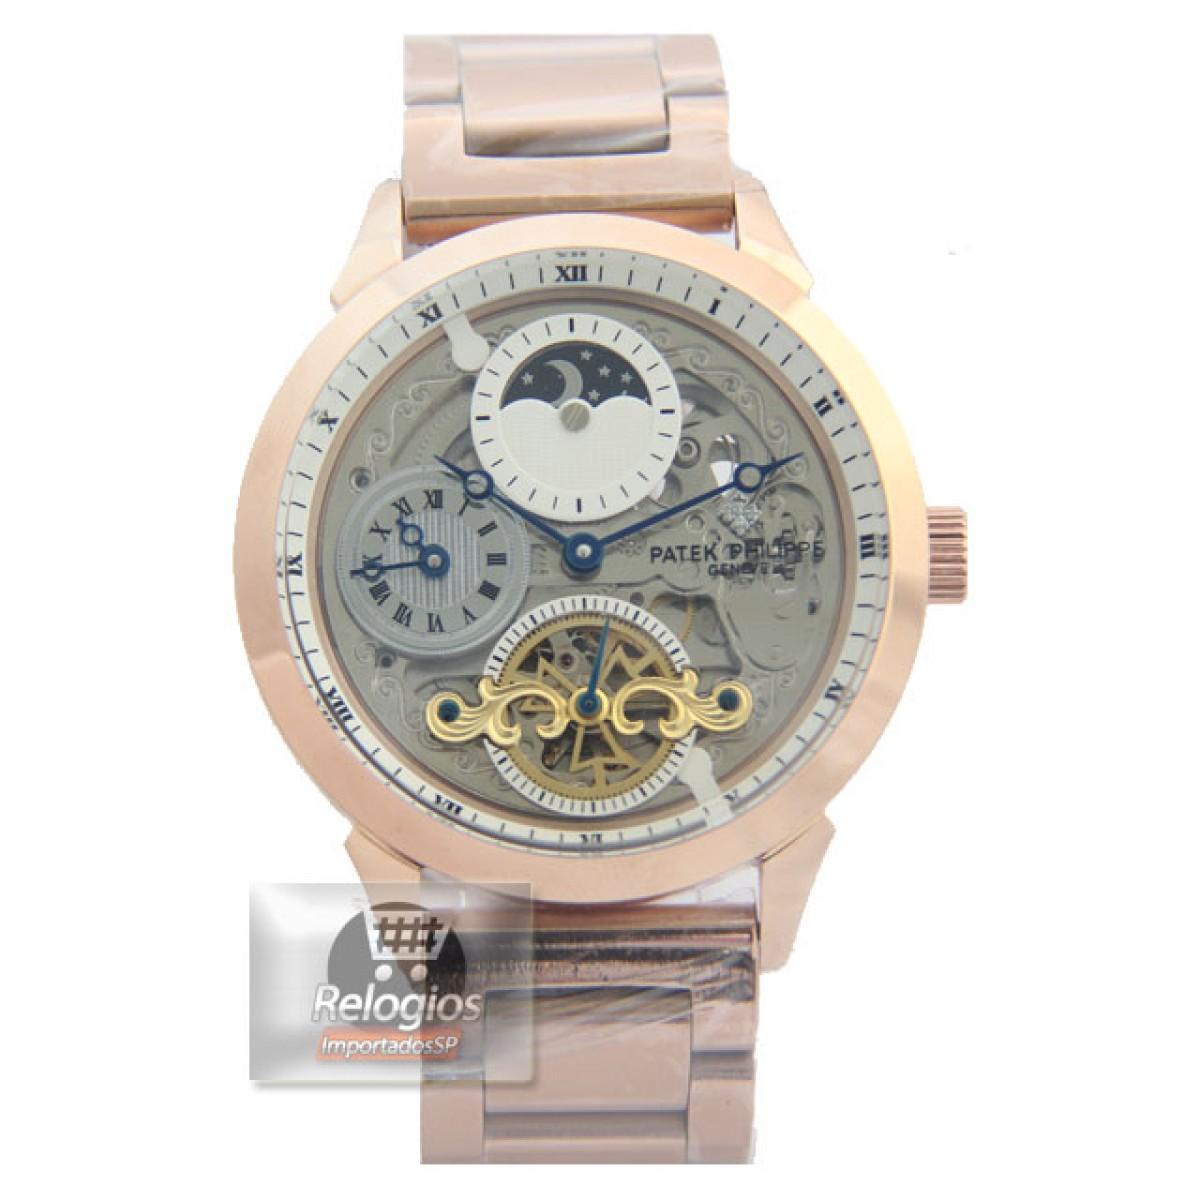 e1dca17cc3d Relógio Réplica Patek Philippe Geneve